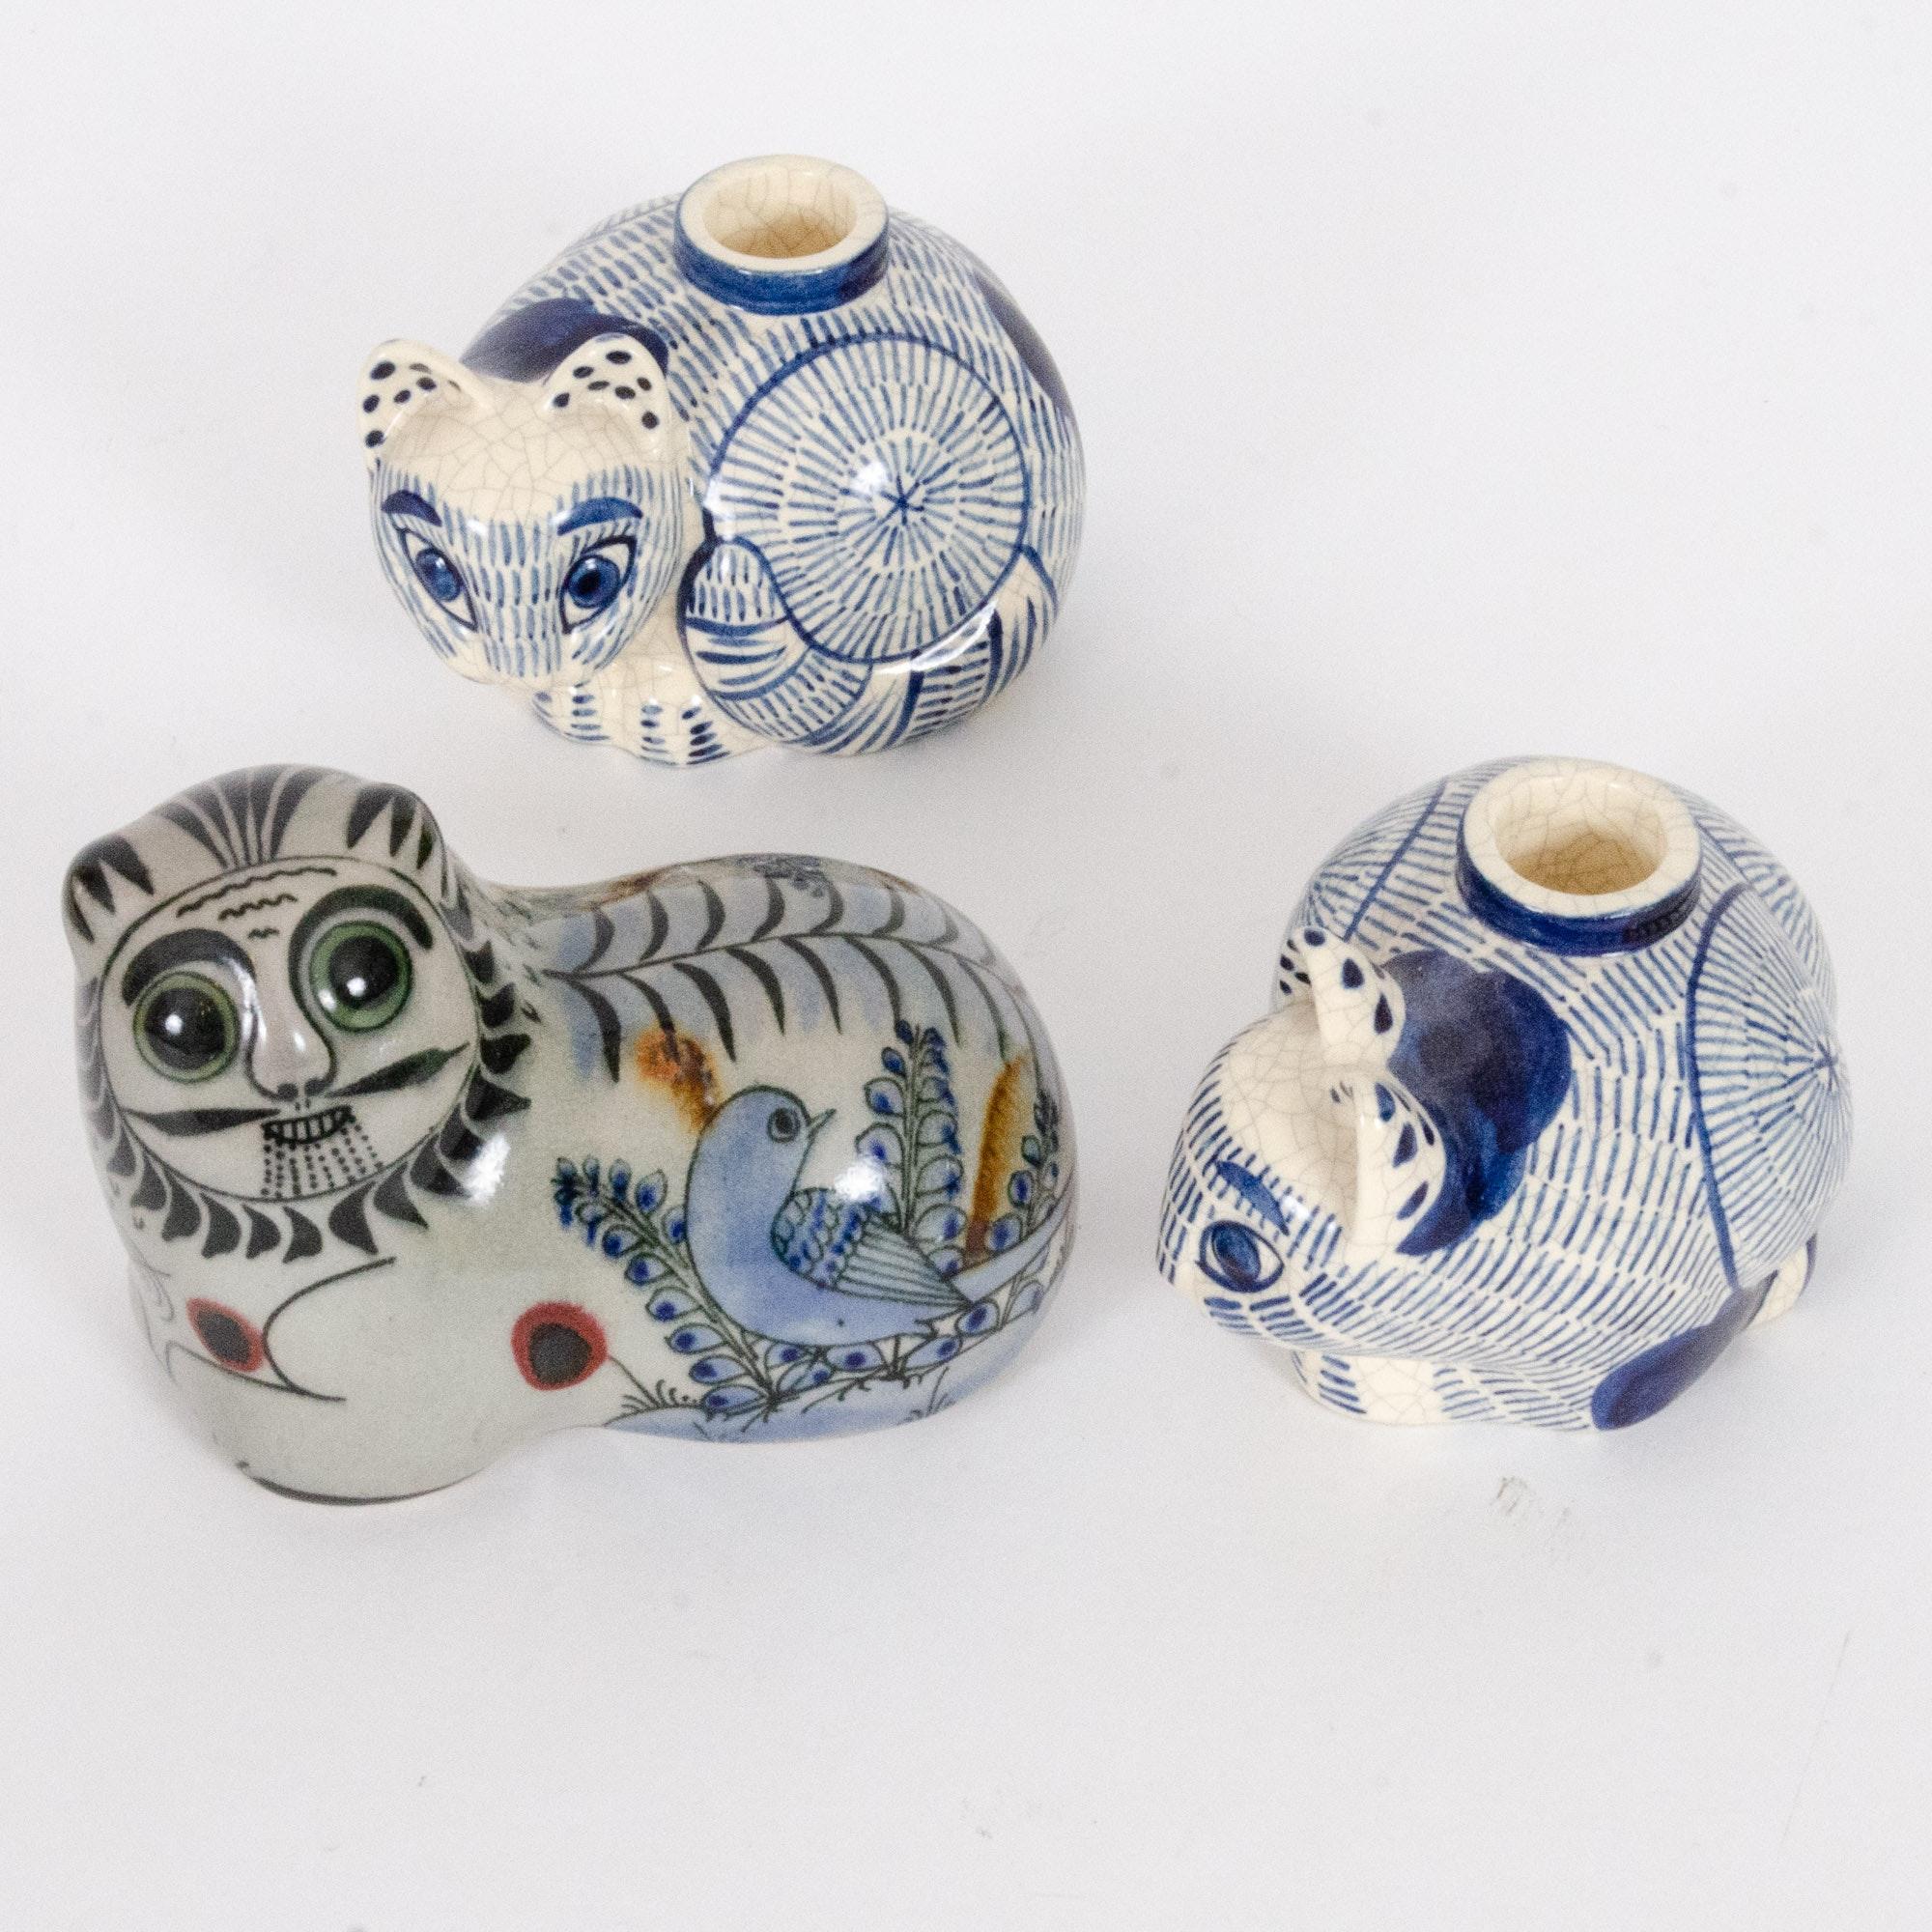 Mexican Tonala Folk Art Pottery Cat Figurine and Nancy Lopez Candleholders